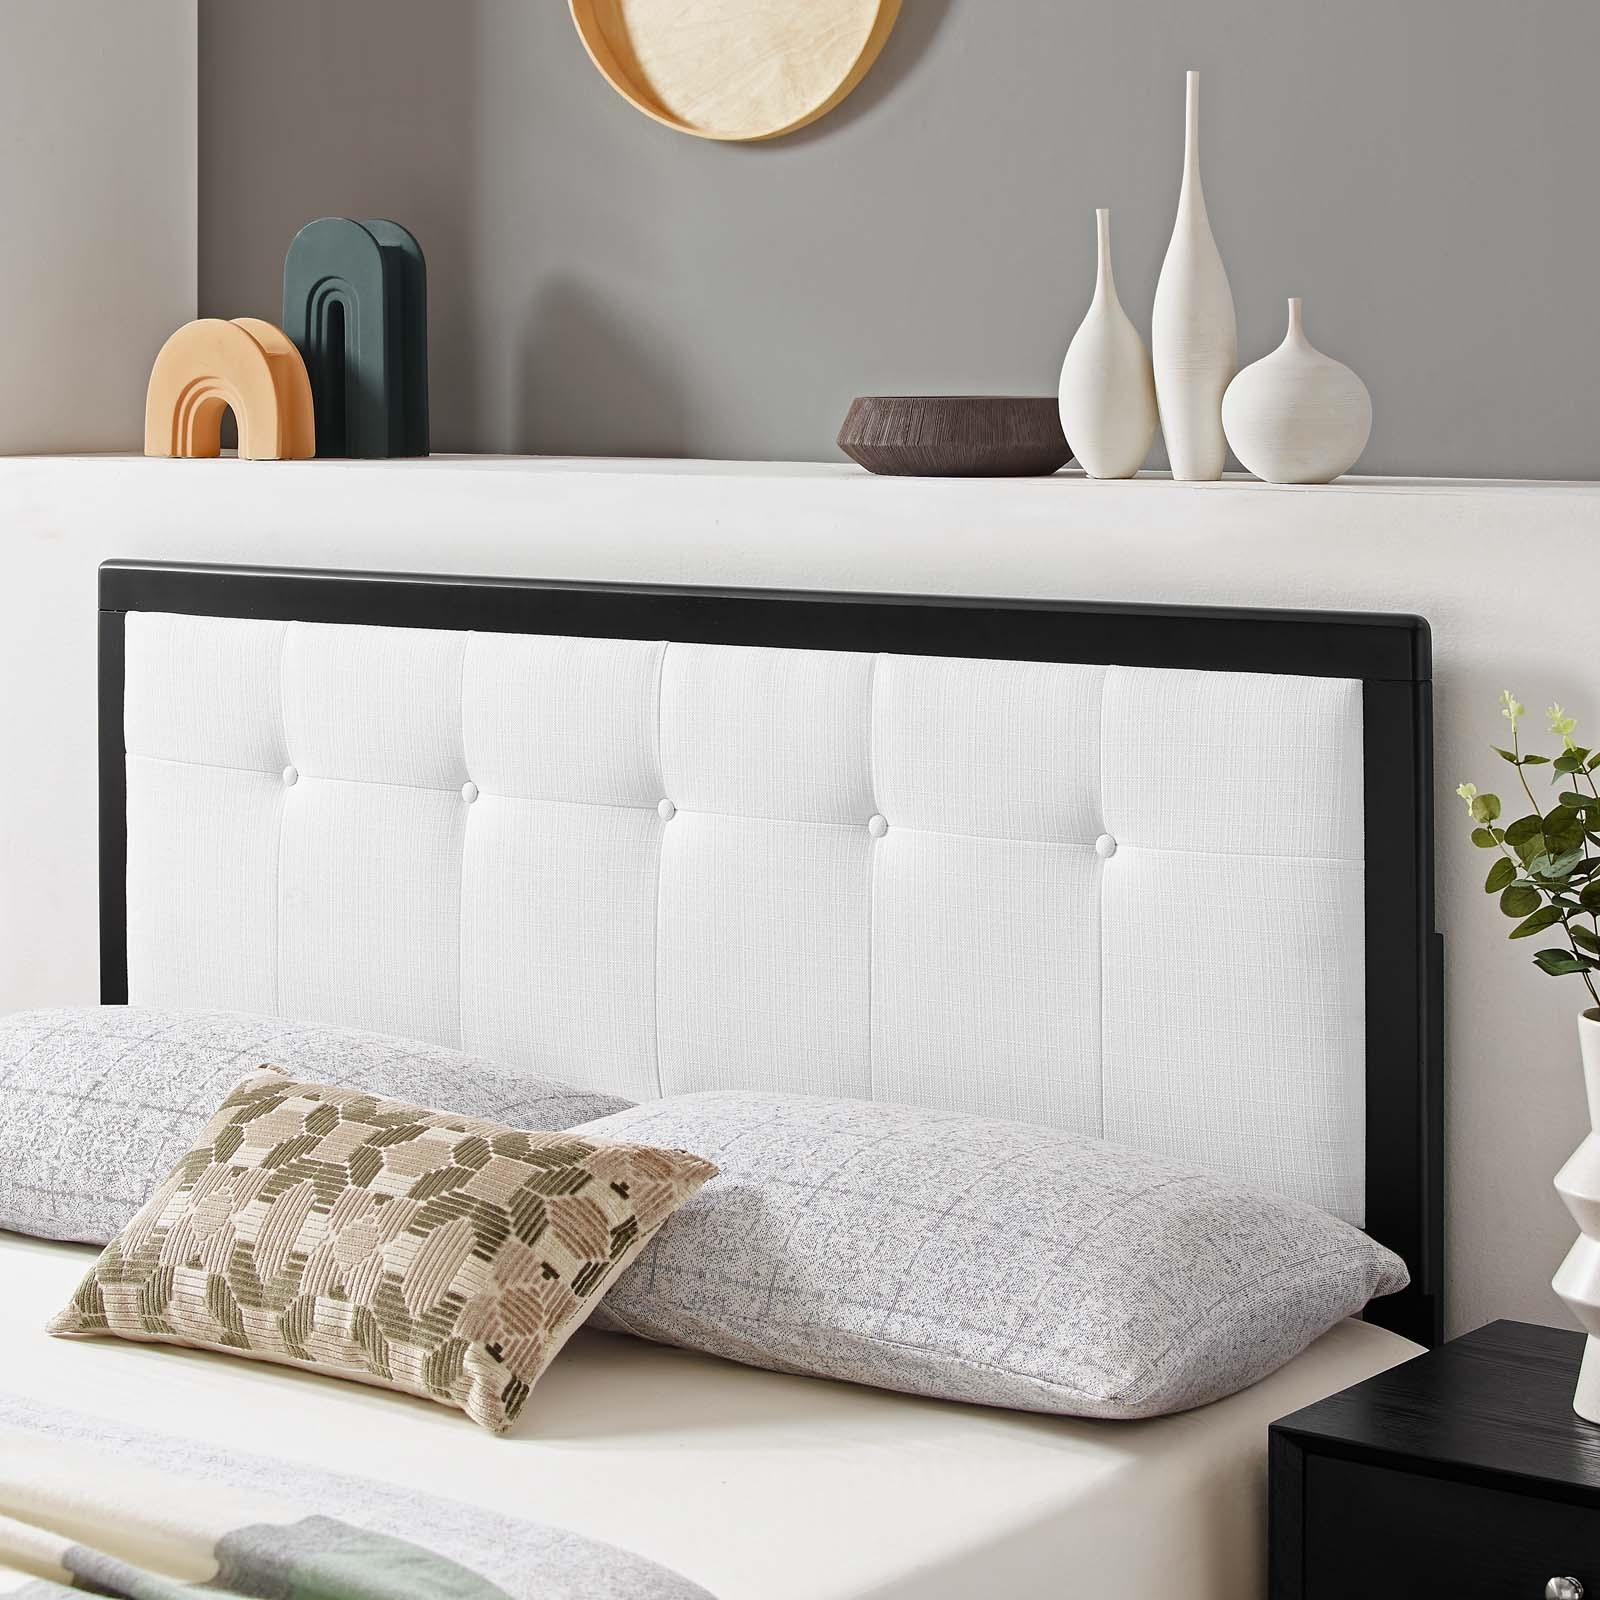 Draper Tufted Twin Fabric and Wood Headboard in Black White